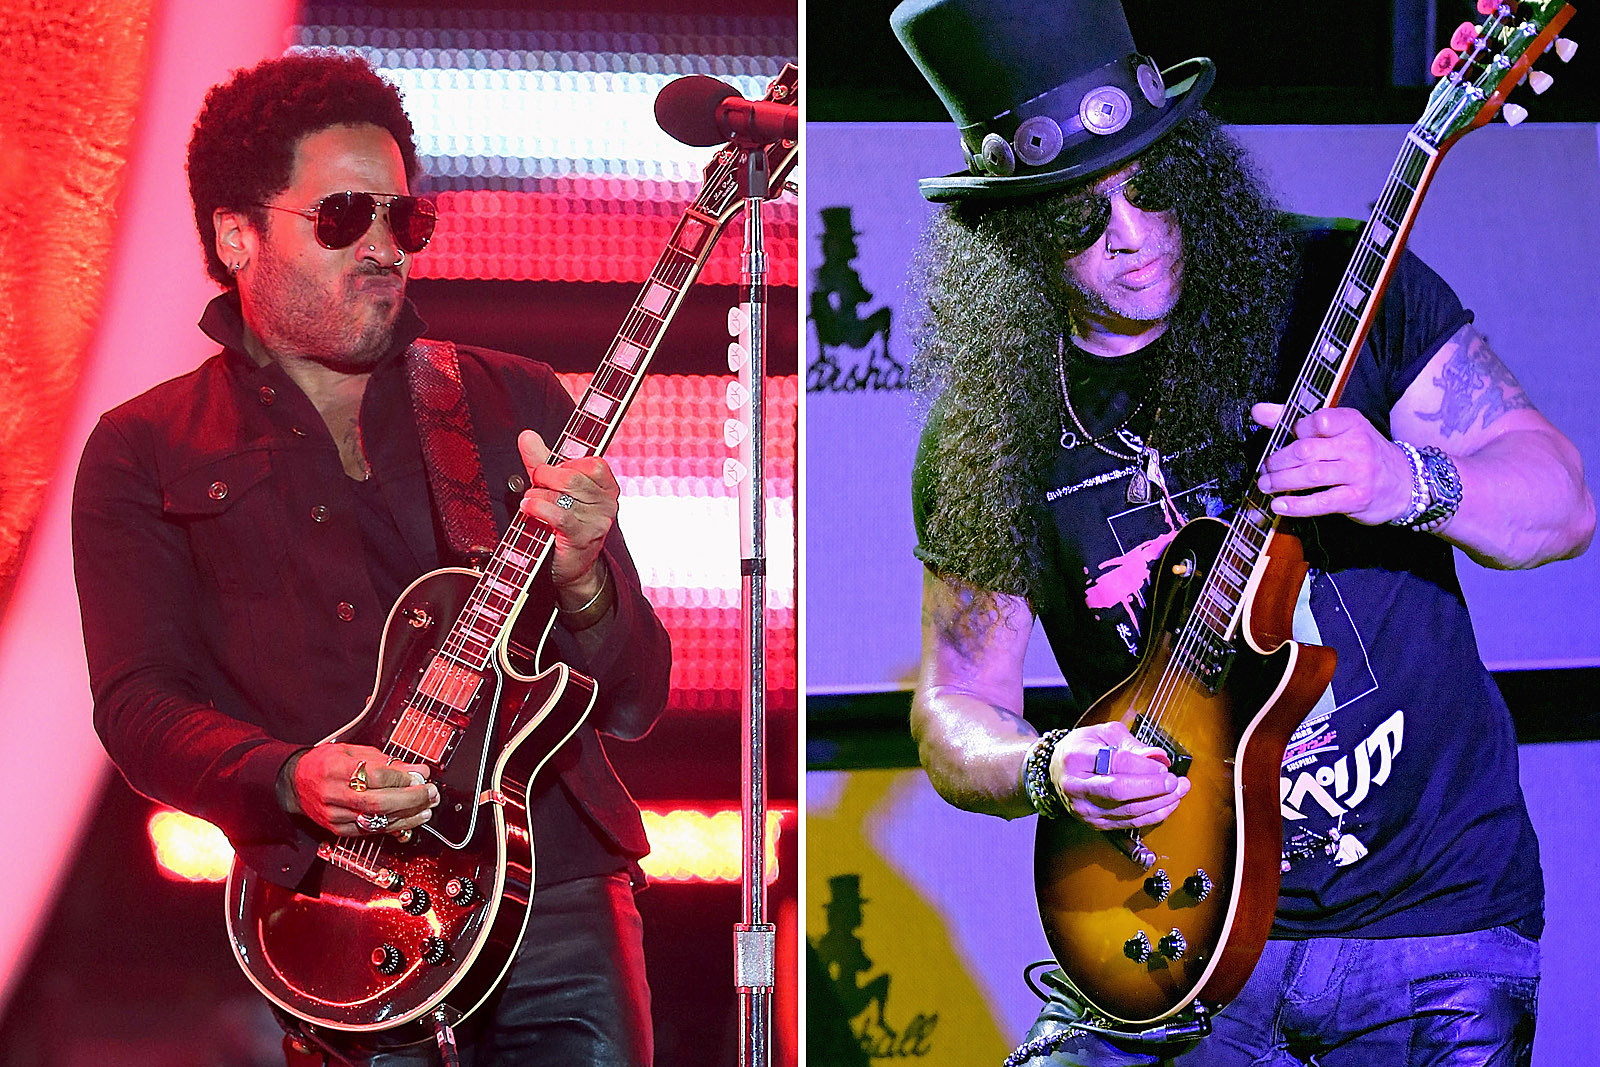 Buckcherry's Josh Todd Doesn't Know Why Slash Split Their Band